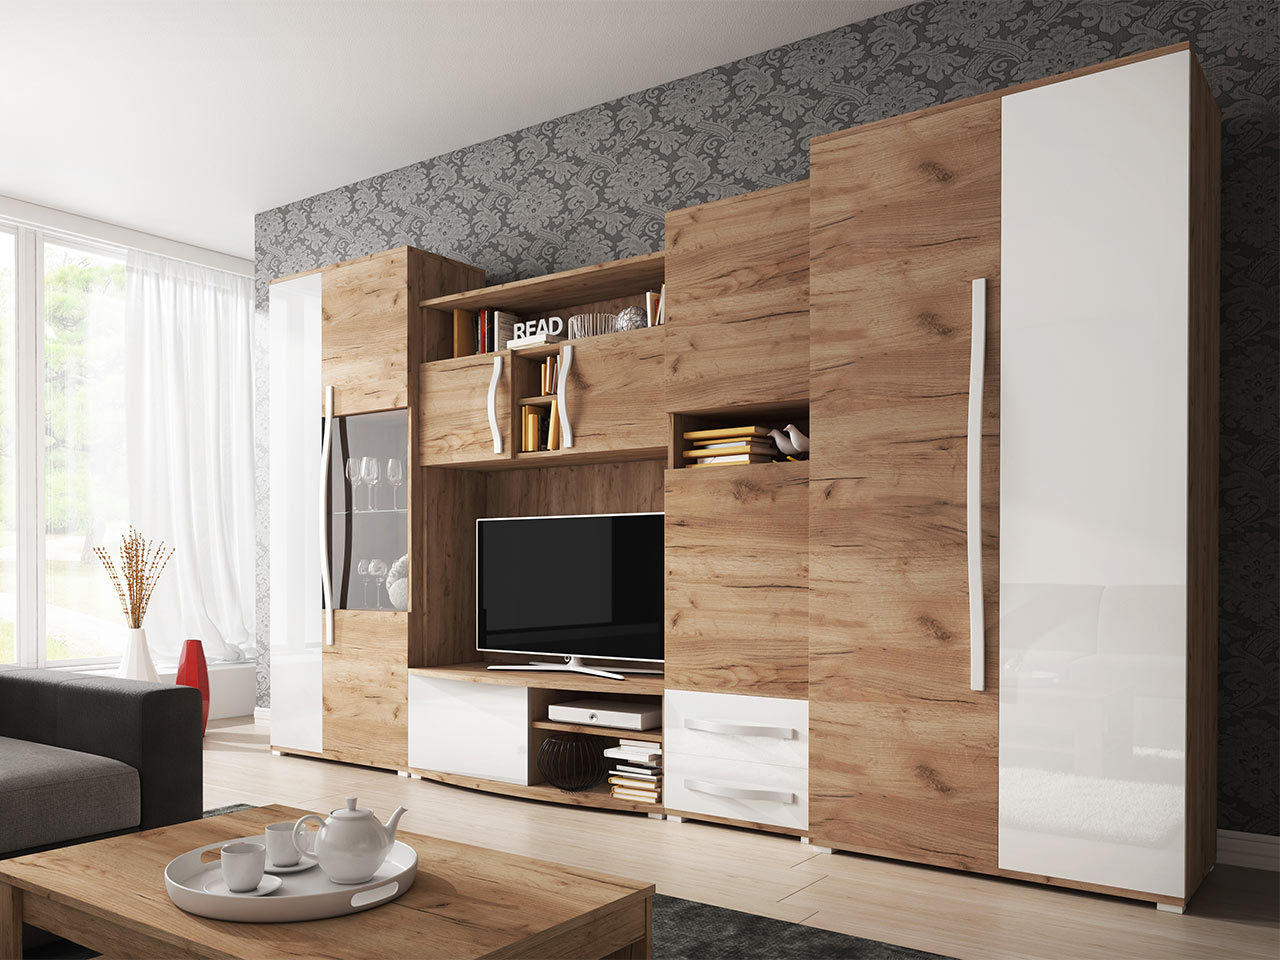 Details zu Wohnwand Laura Wohnzimmer Anbauwand TV Lowboard Regal Schrank  Modern Design NEU